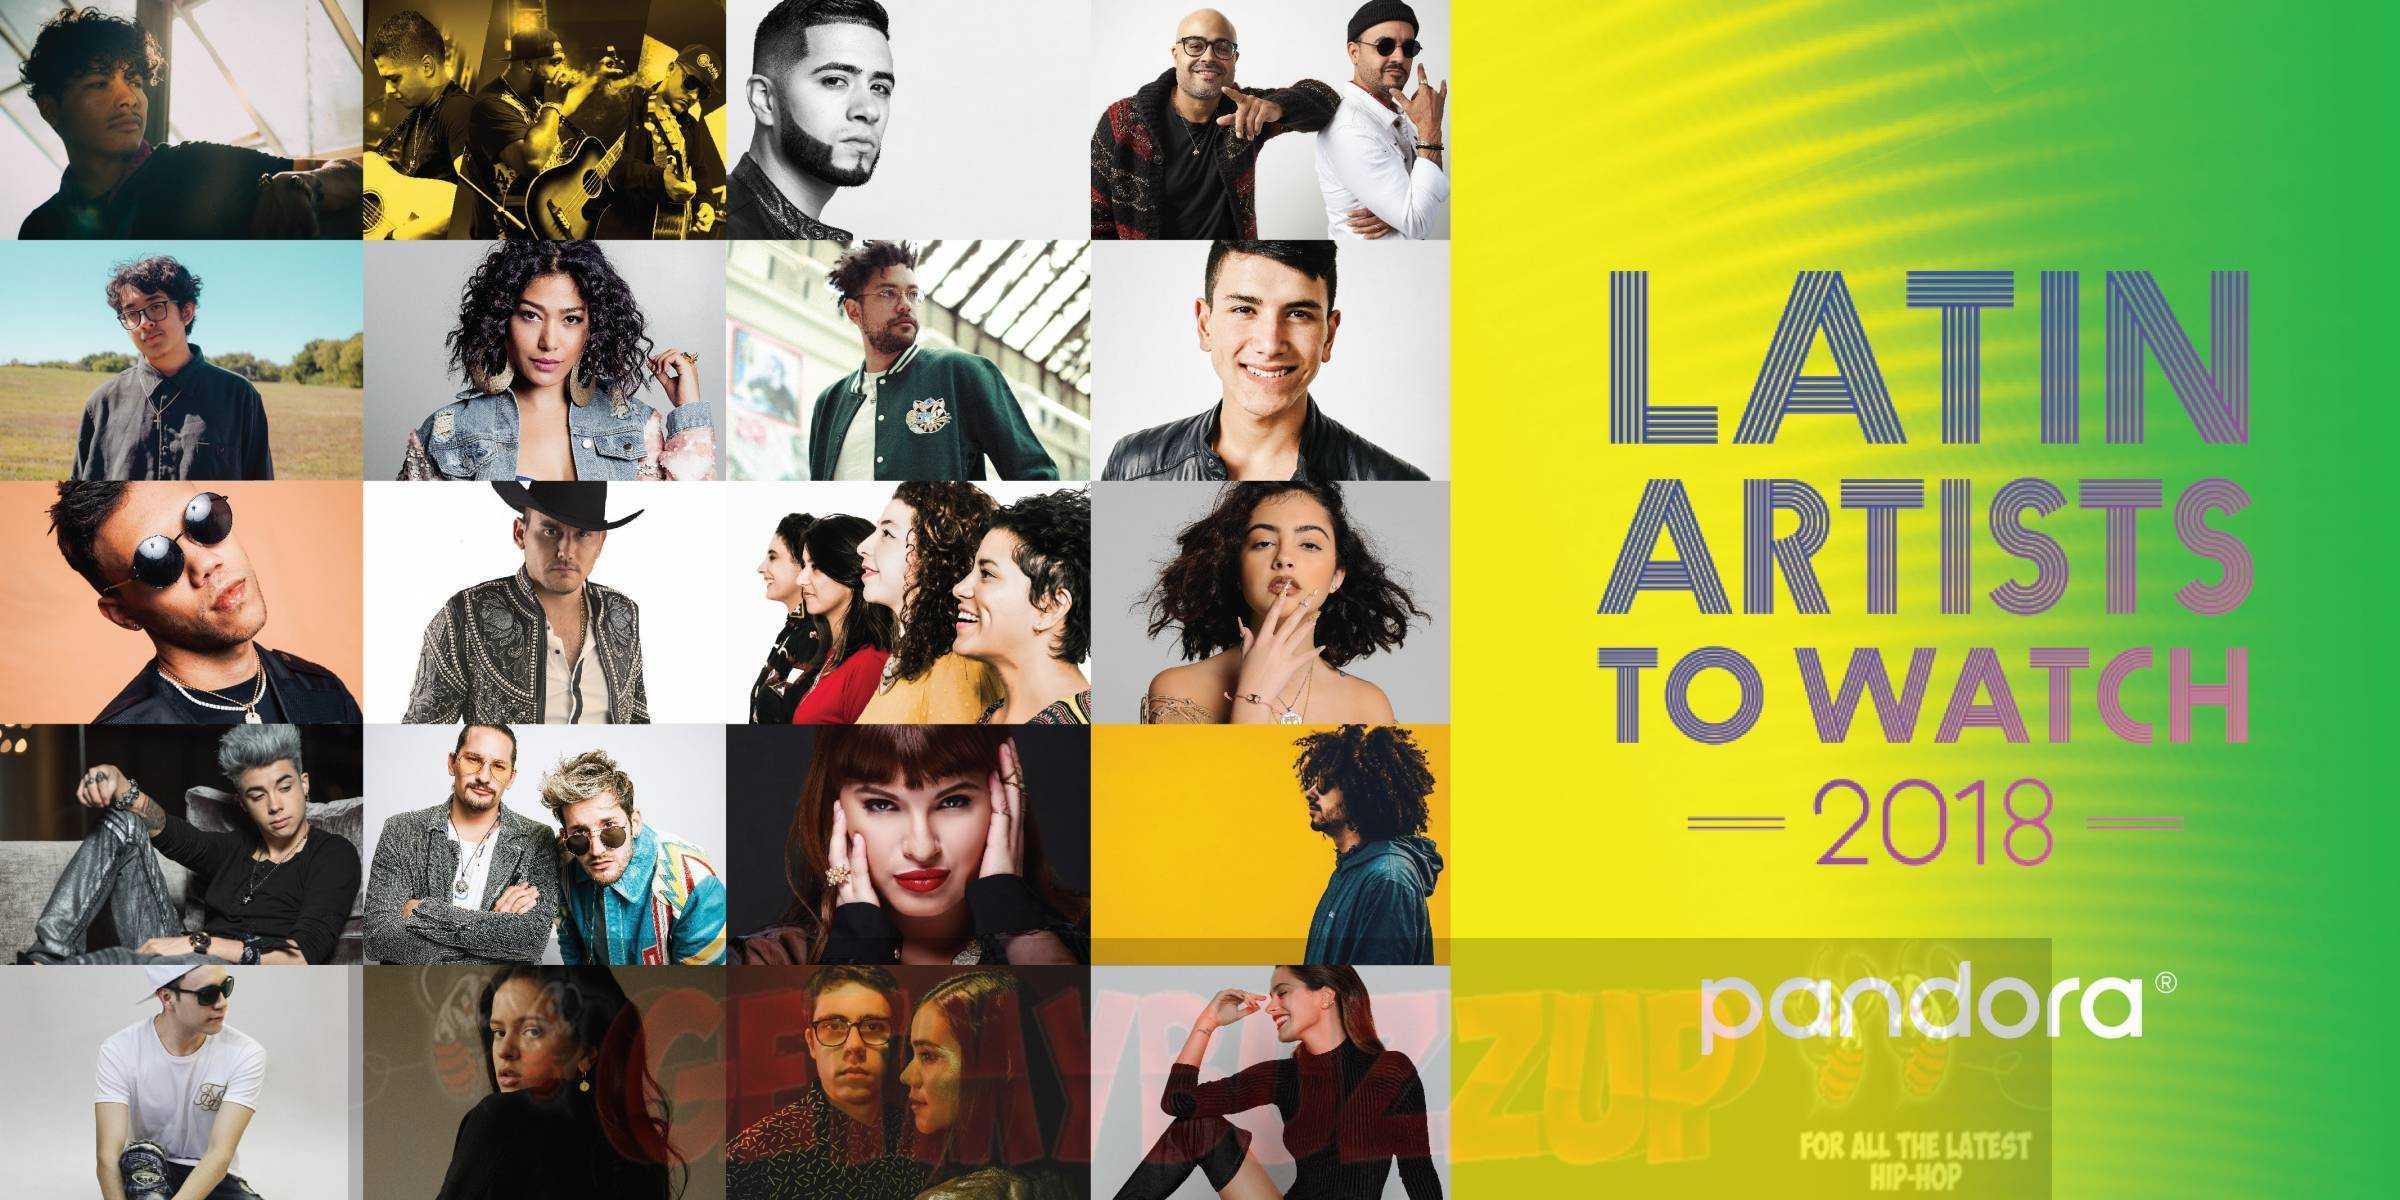 Melymel, A.CHAL, COASTCITY, & Jesse Baez are Pandora's Latin Artists to Watch 2018!